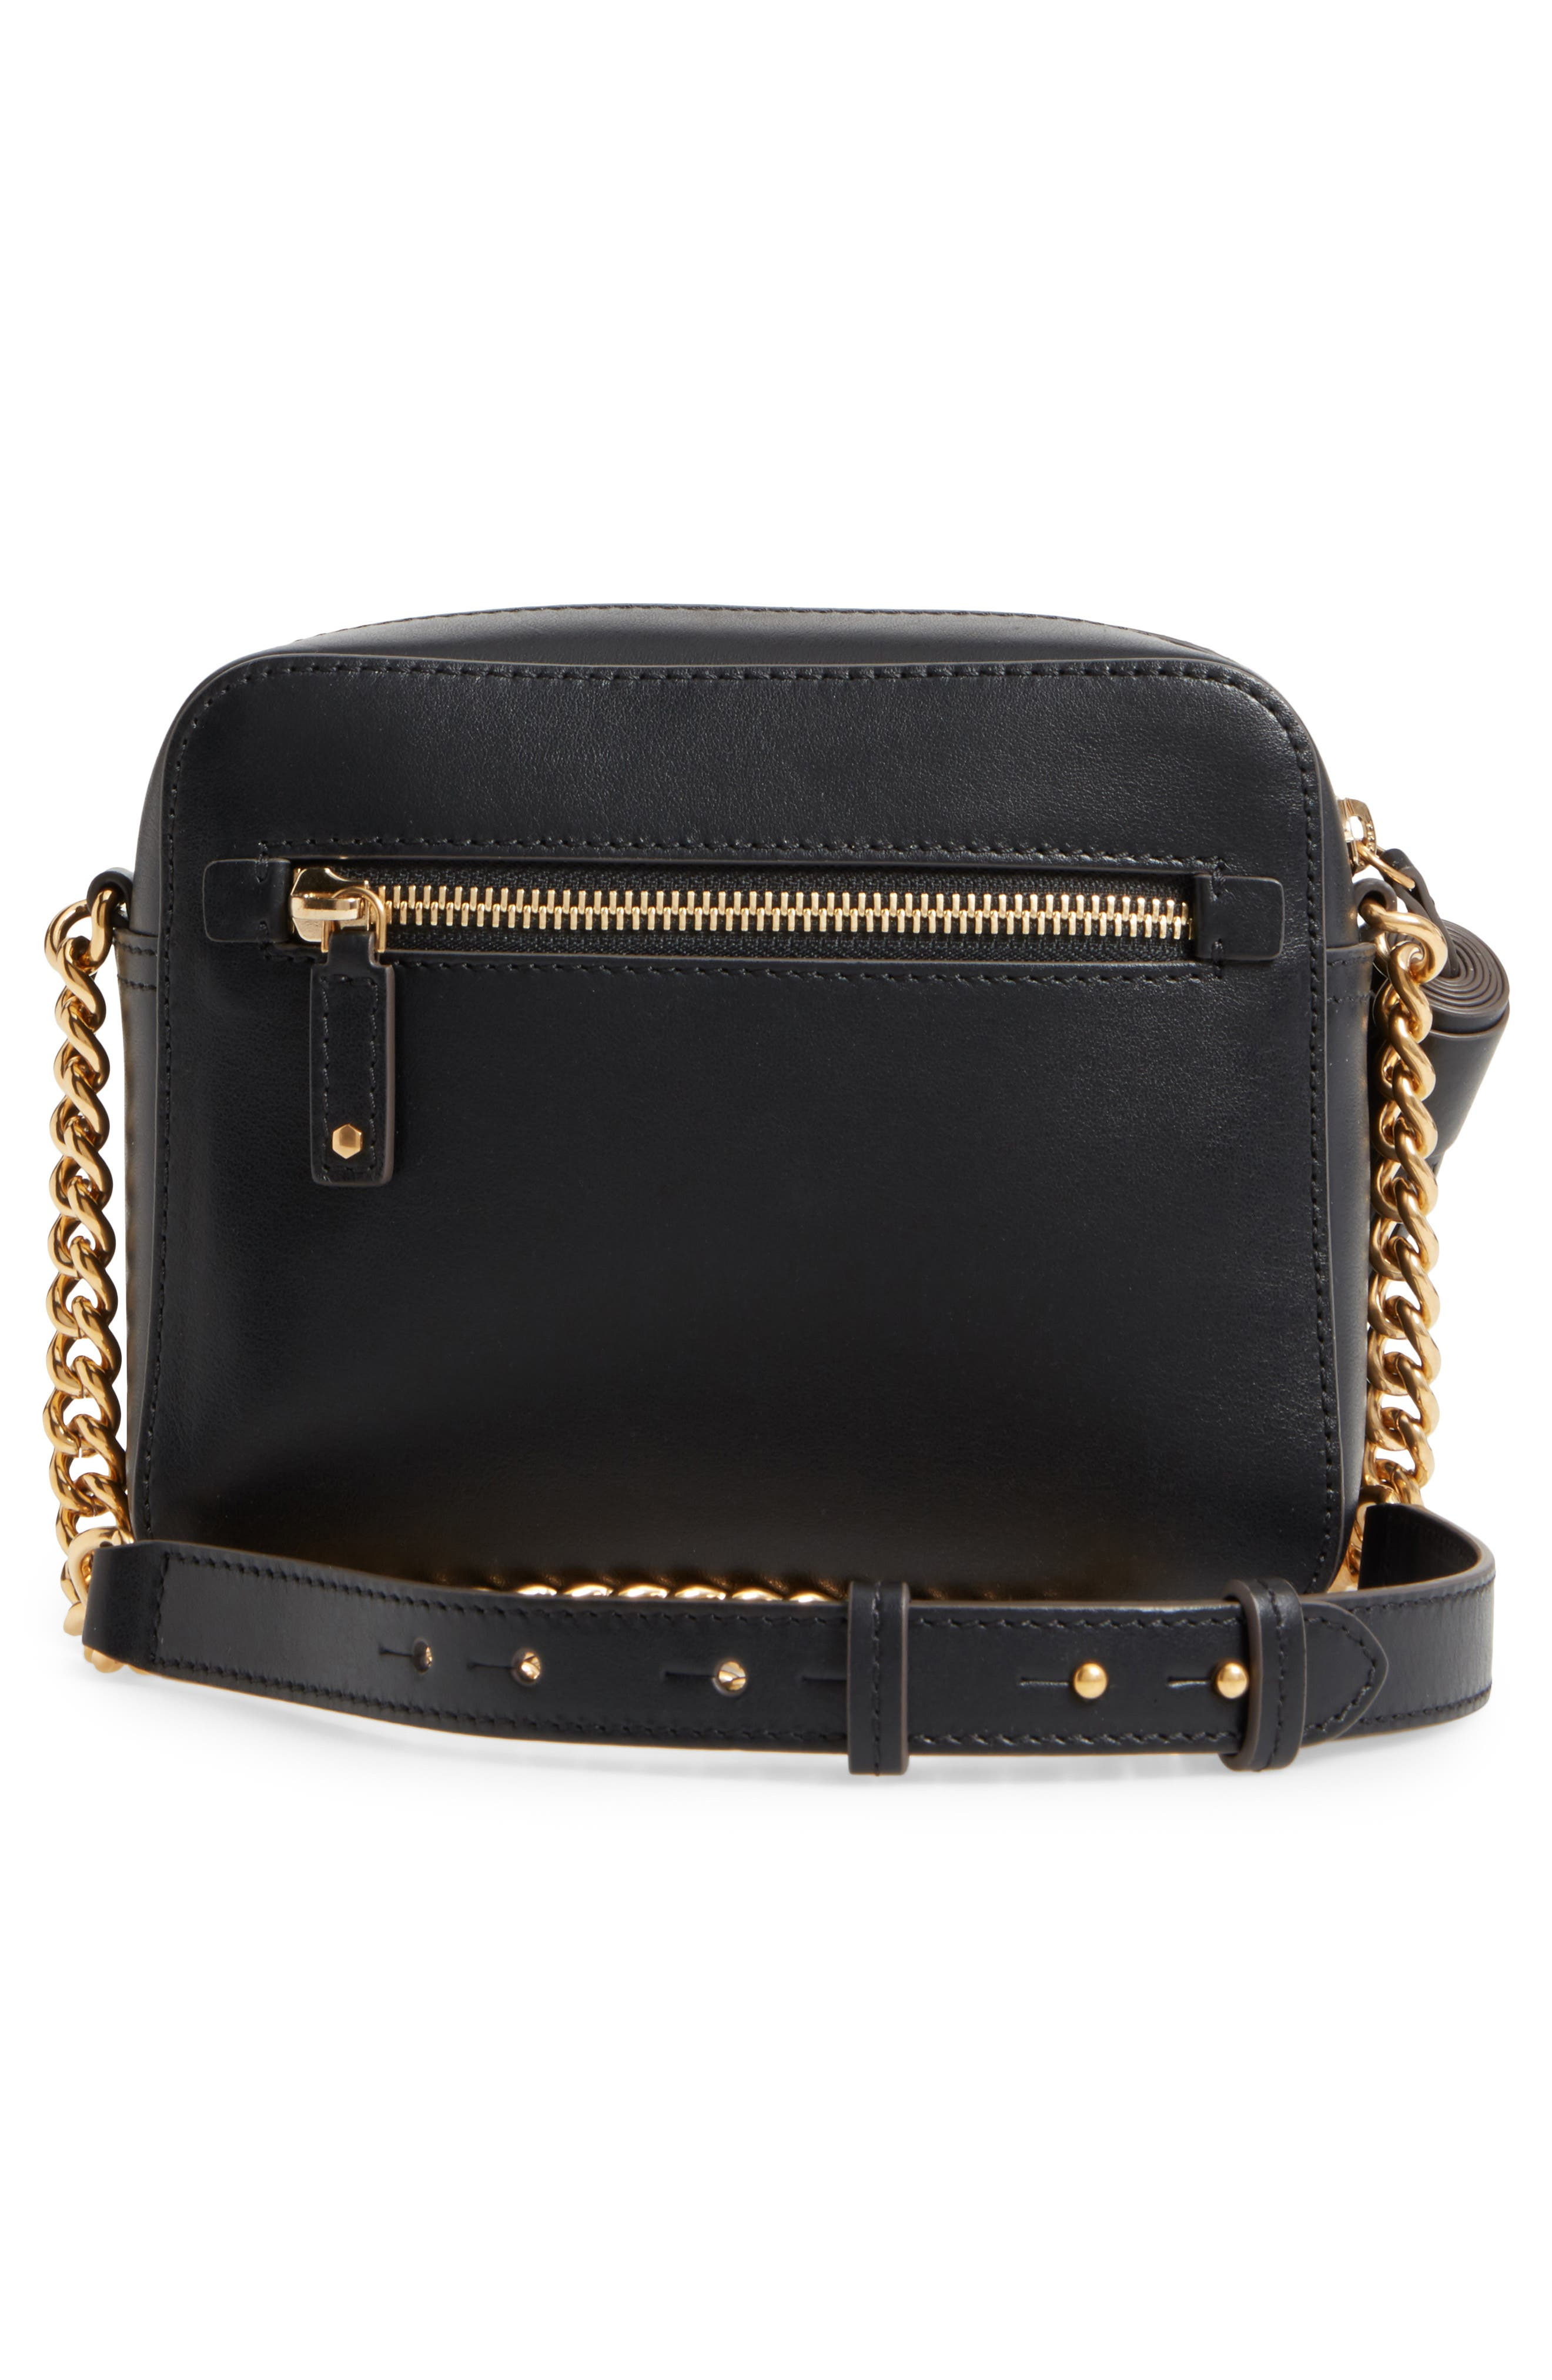 Eyes Camera Leather Crossbody Bag,                             Alternate thumbnail 3, color,                             BLACK